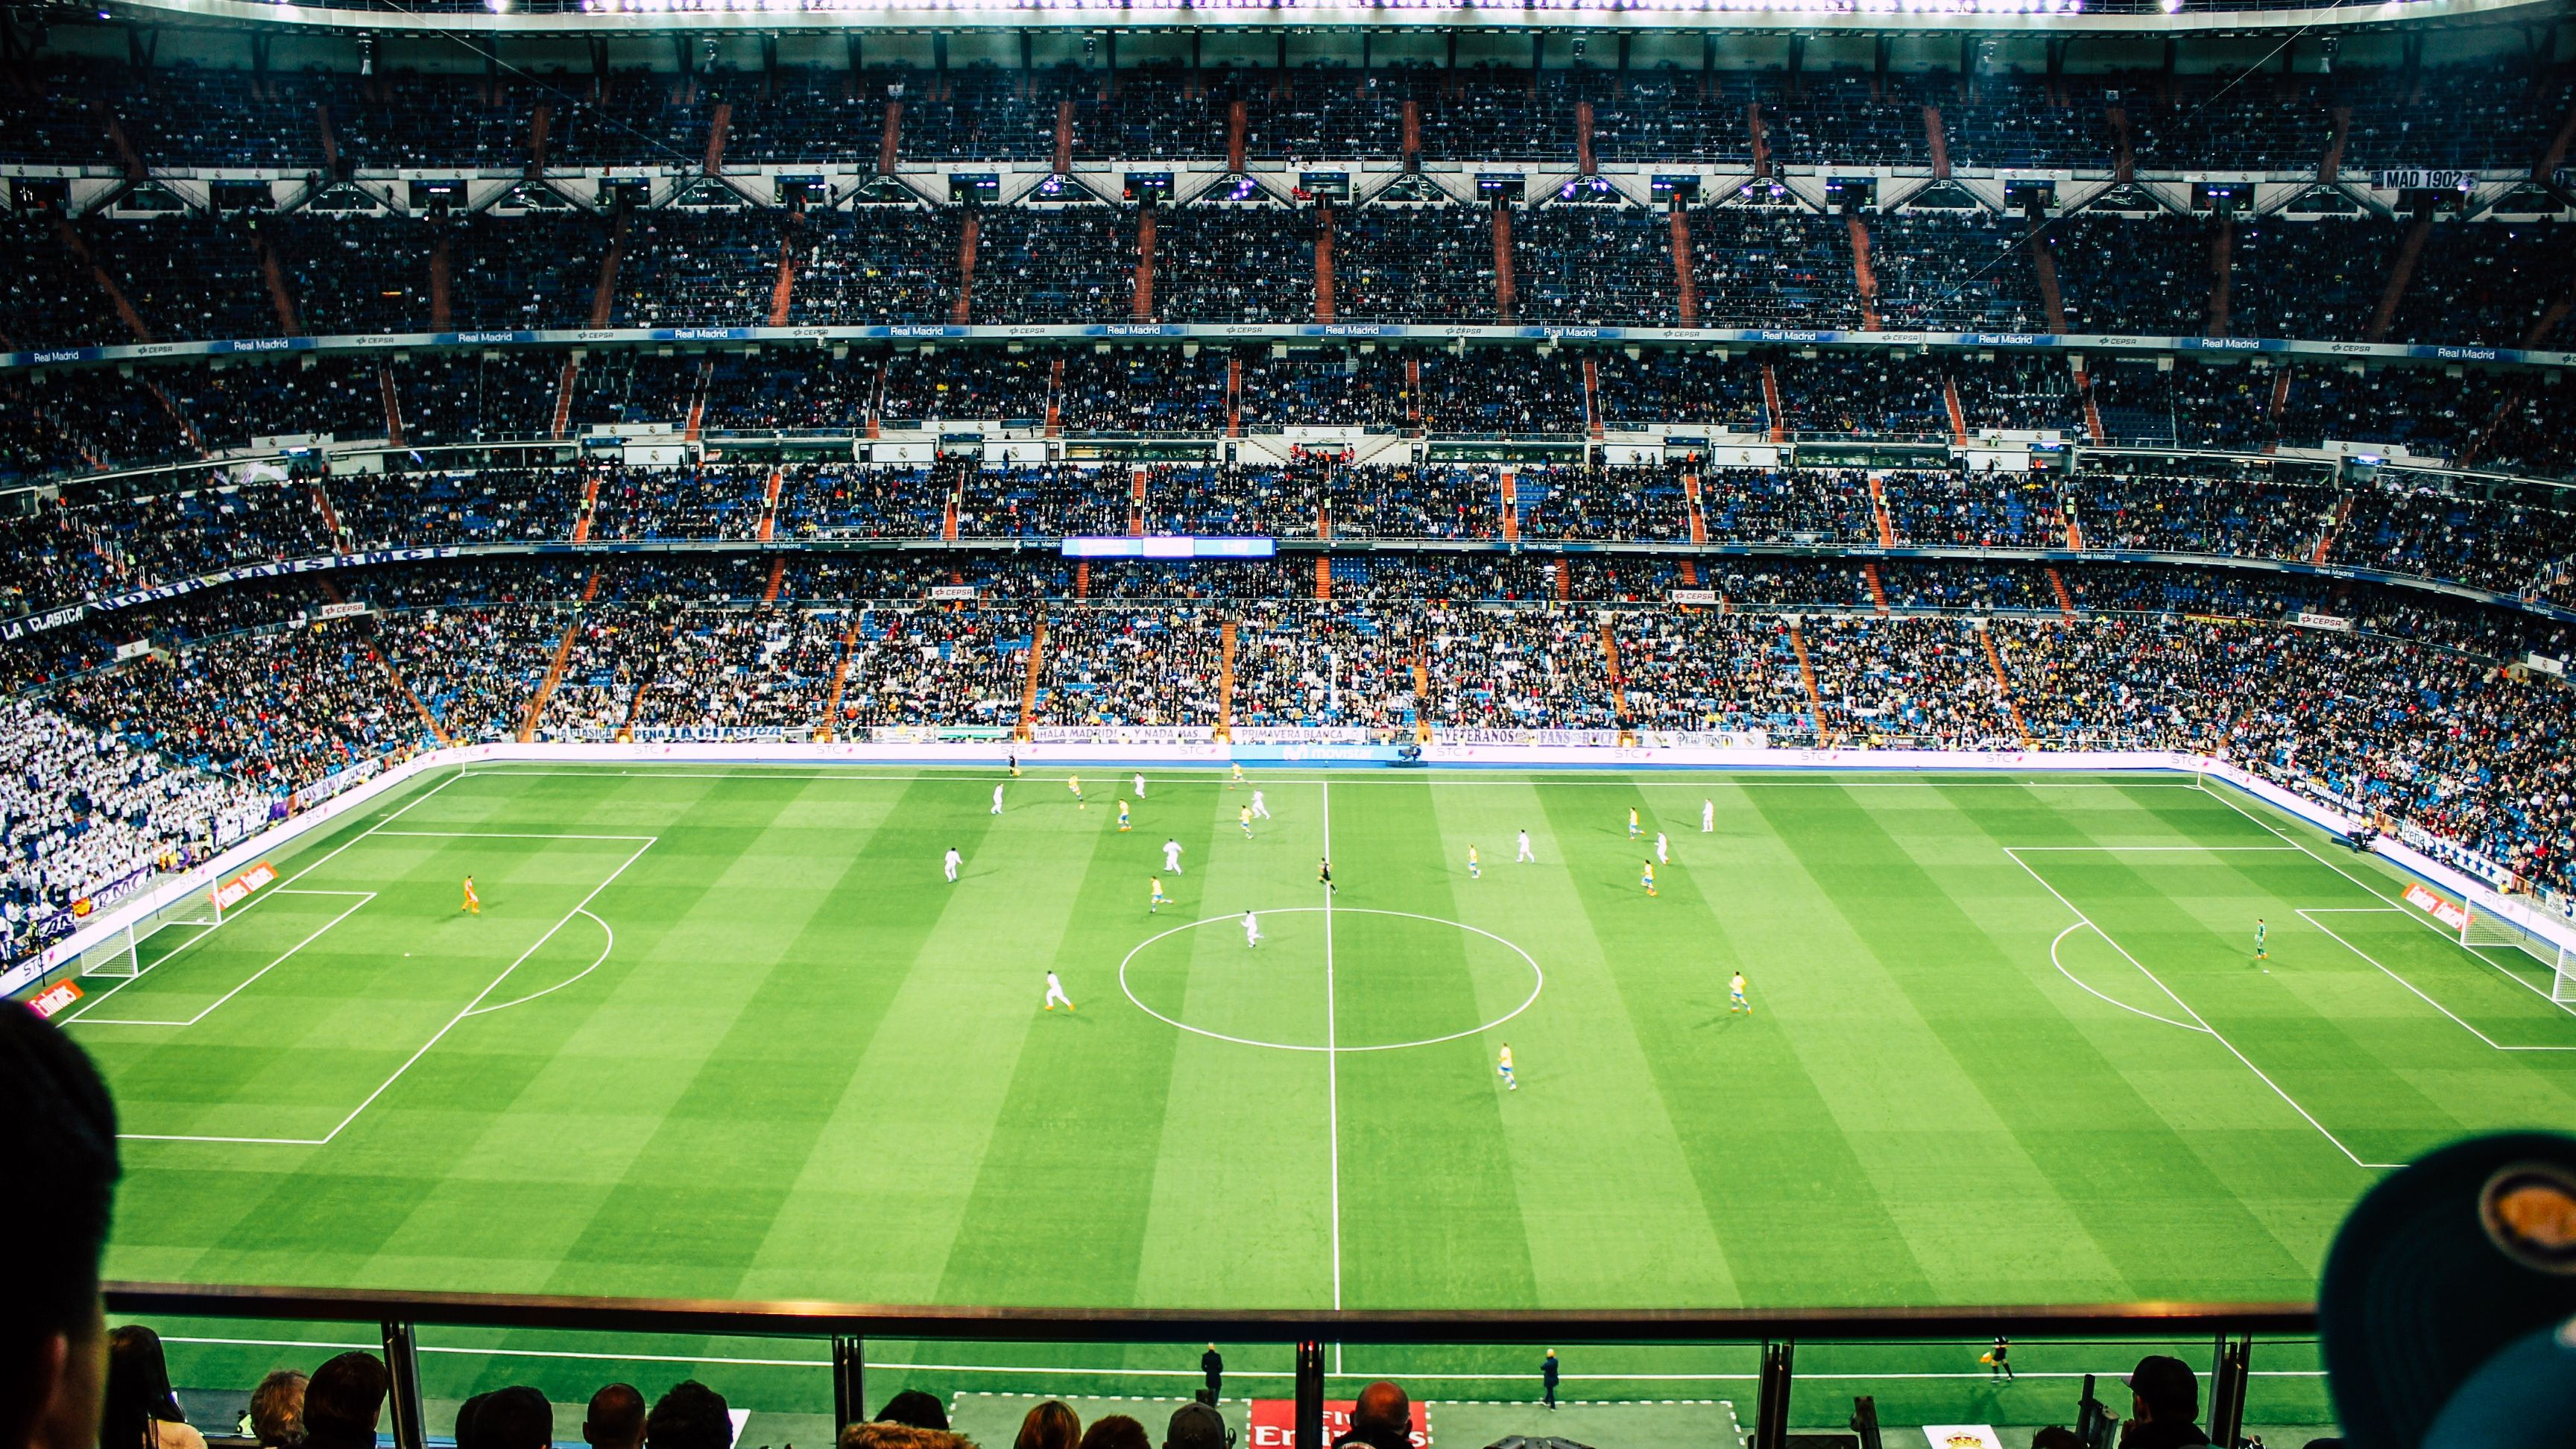 AIの次なる挑戦は「サッカー」、グーグルがシミュレーターを公開